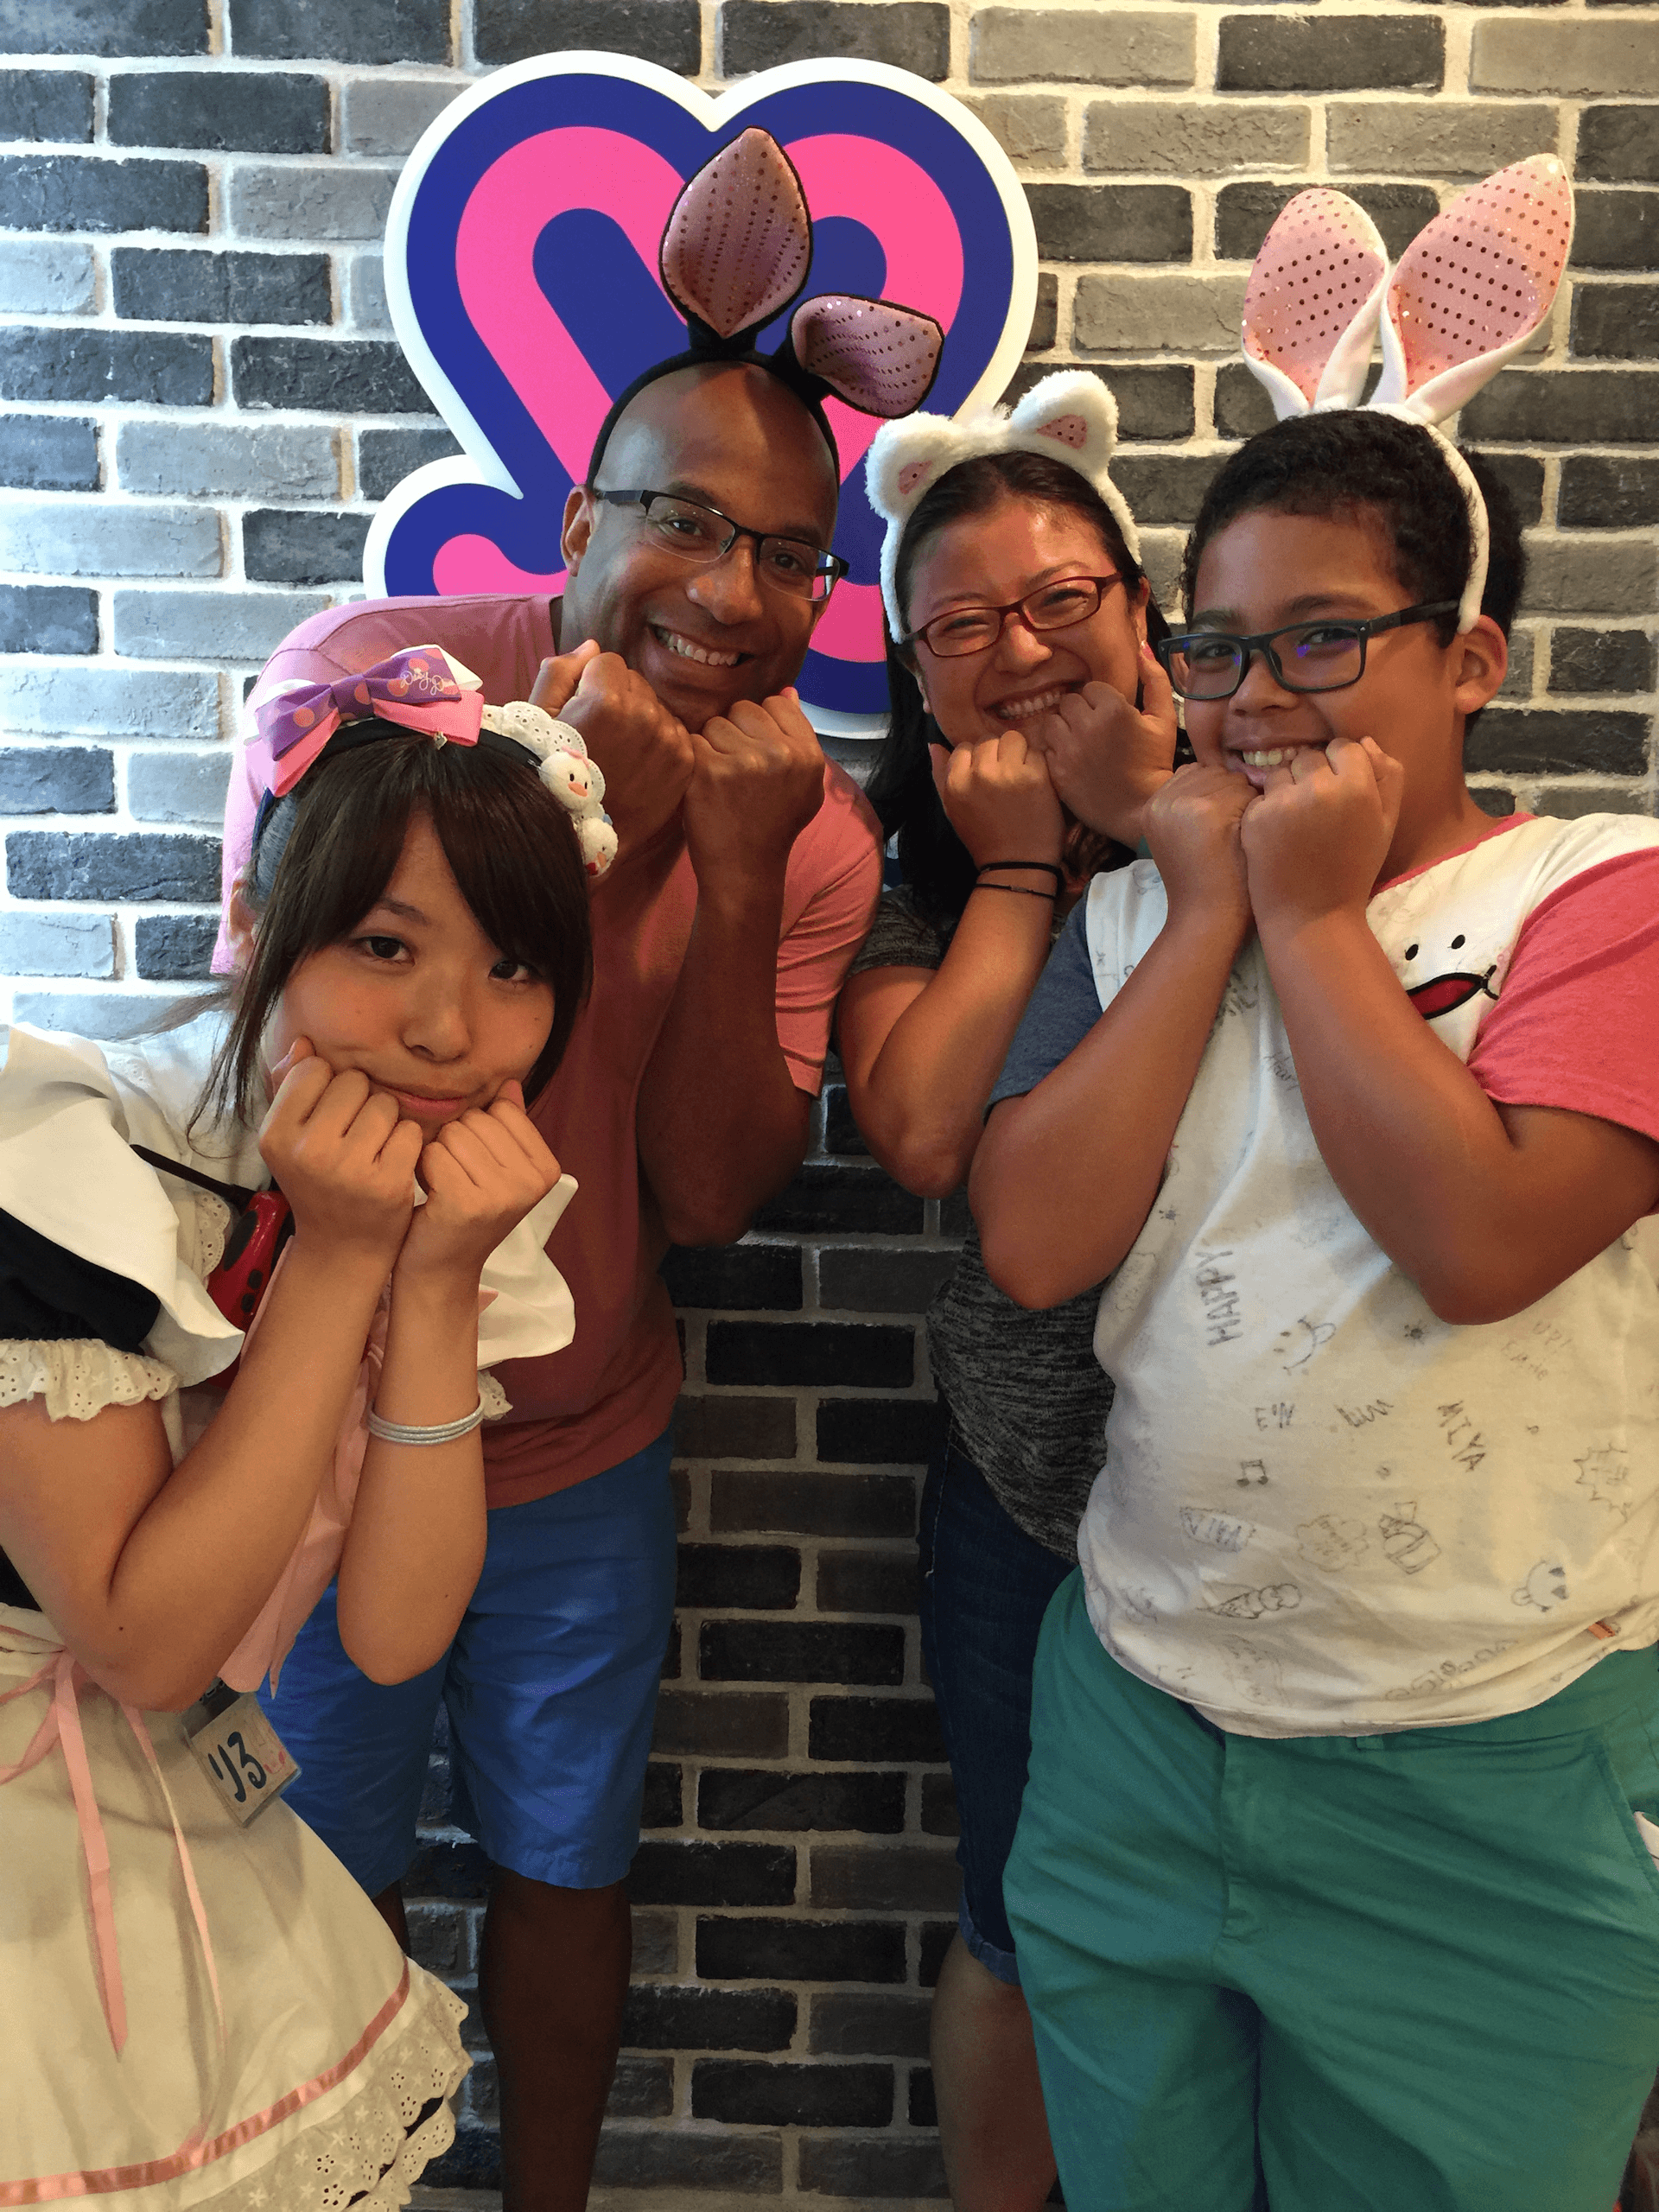 Credits - Walking Around Akihabara Tokyo What To Do 2018 - Loot Anime Discount Code 2018 🇯🇵 🏙 📦